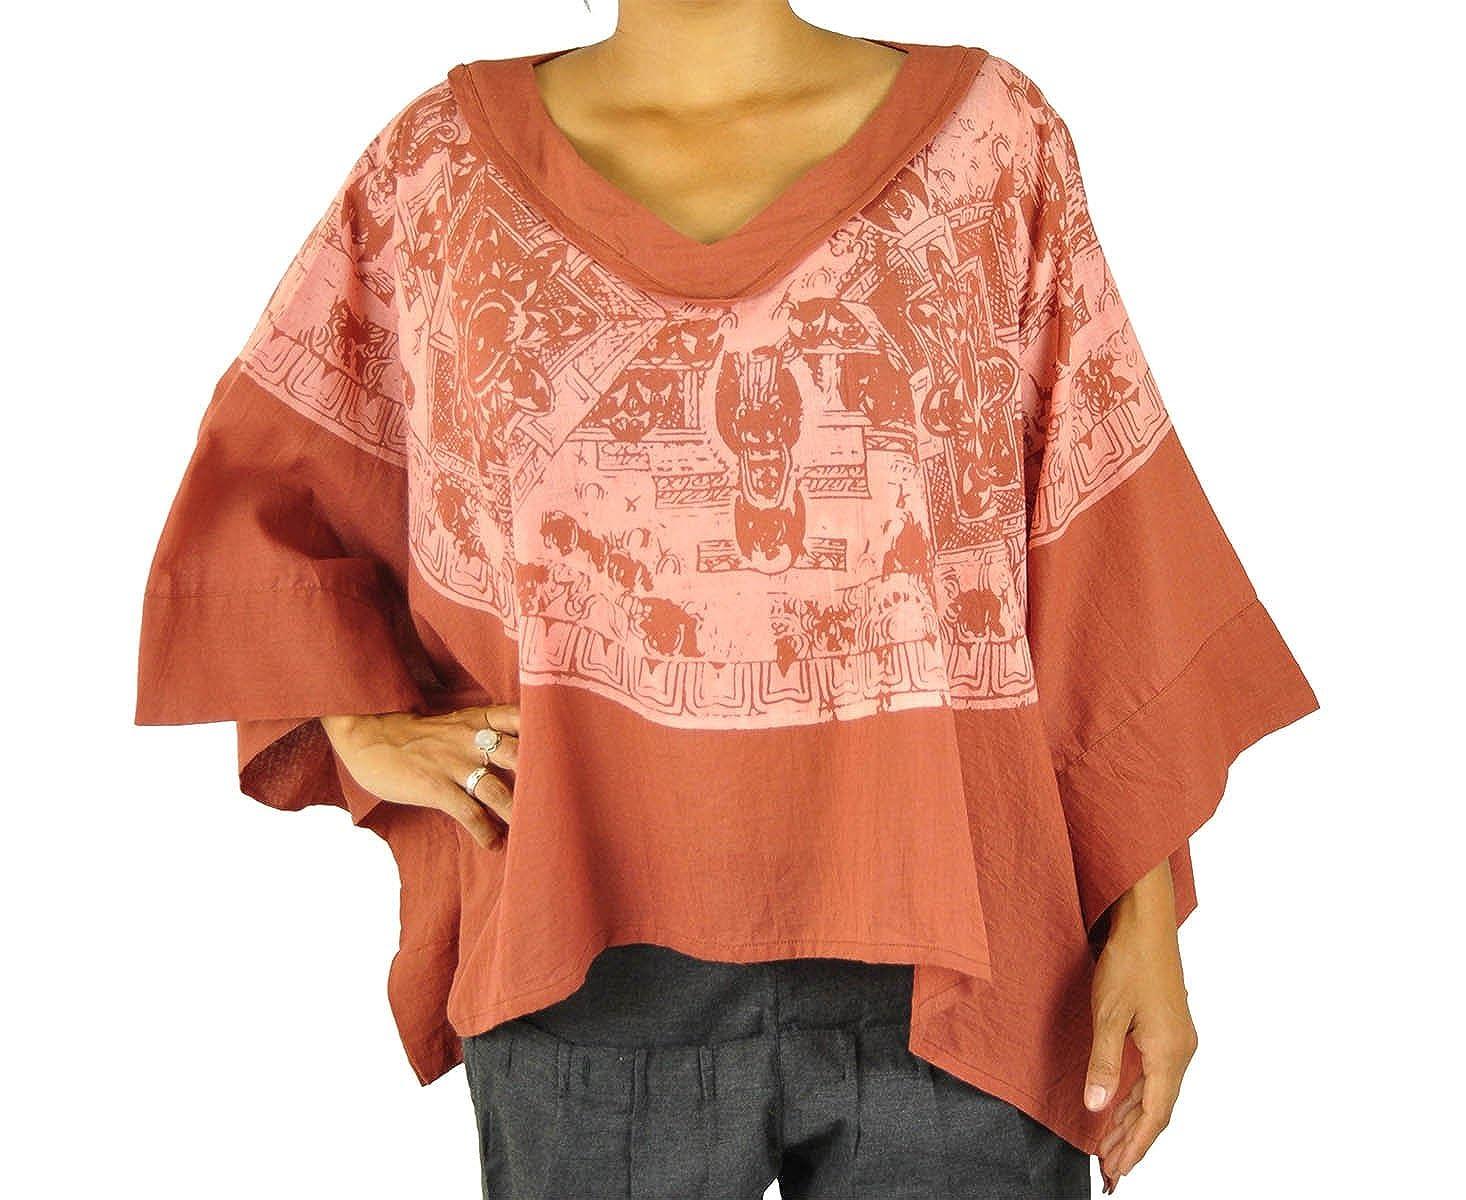 TALLA S-XL. virblatt Alternativa Poncho Ropa señoras Hippie Alternativa Fashion Parte Superior con Pintado a Mano Mandala One-Size-Fits tamaños S-XL–Mercadillo